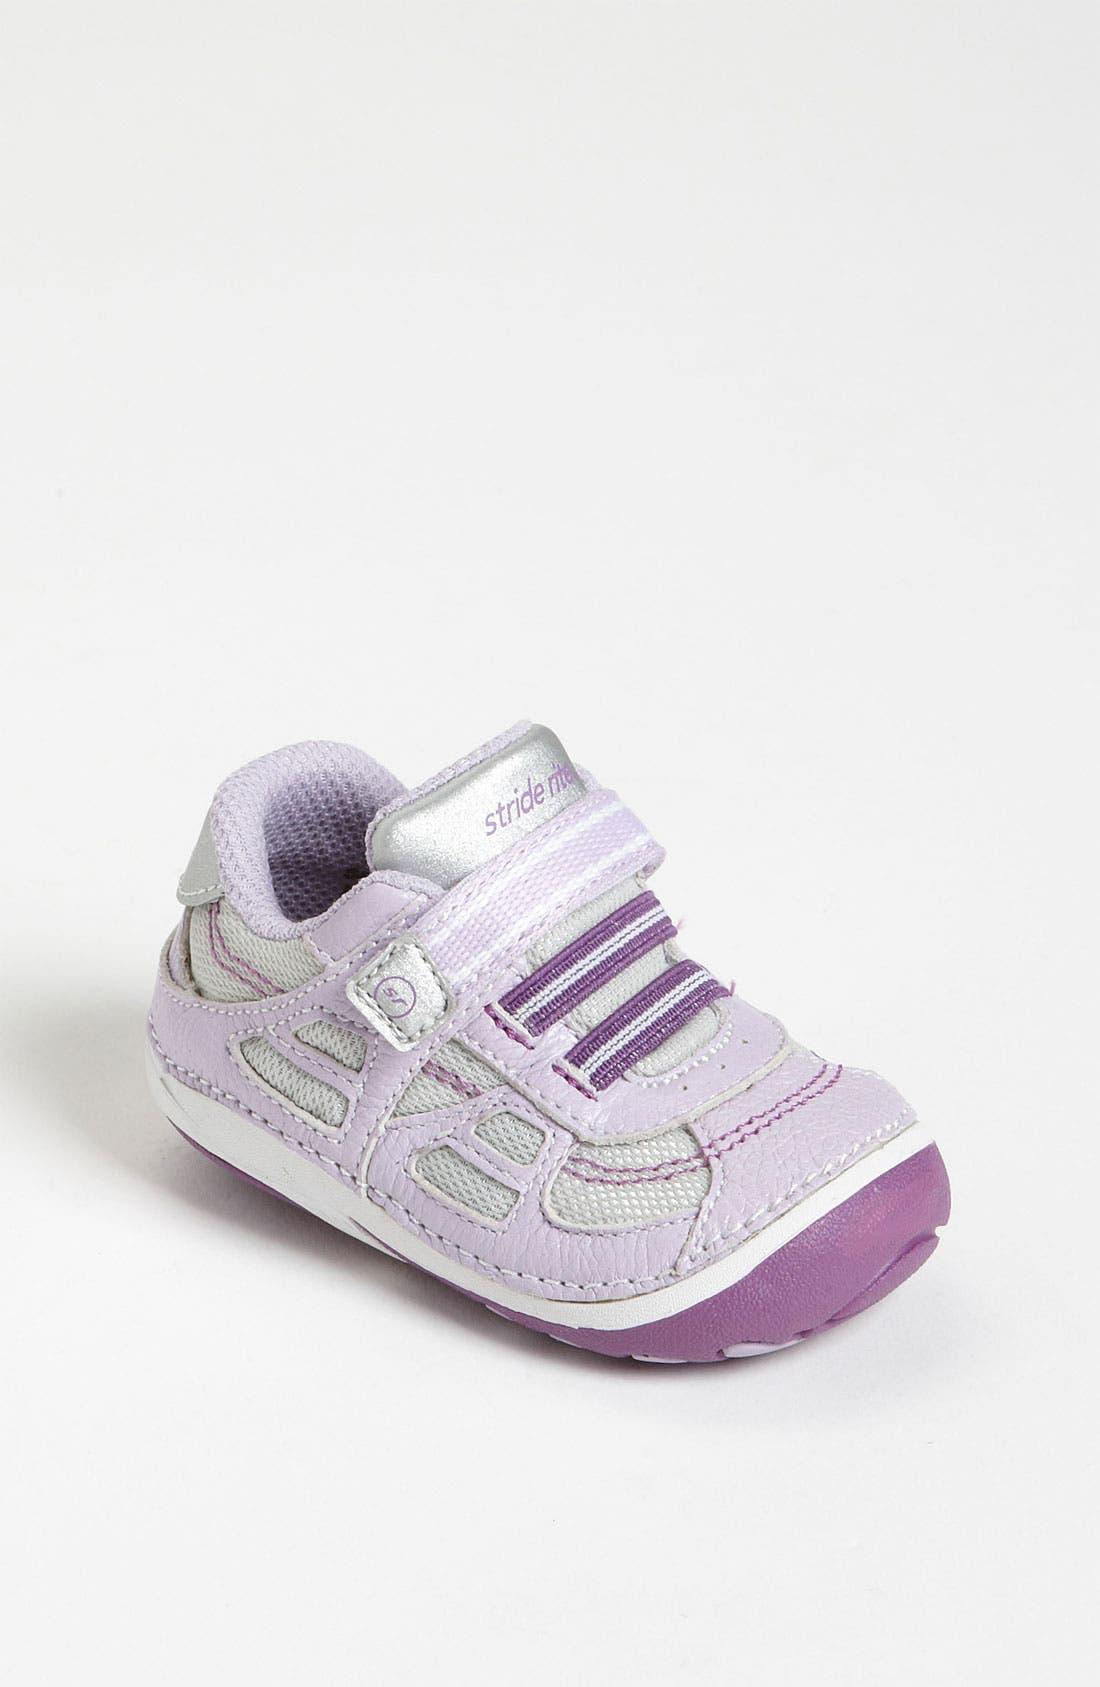 Alternate Image 1 Selected - Stride Rite 'Tinka' Sneaker (Baby & Walker)